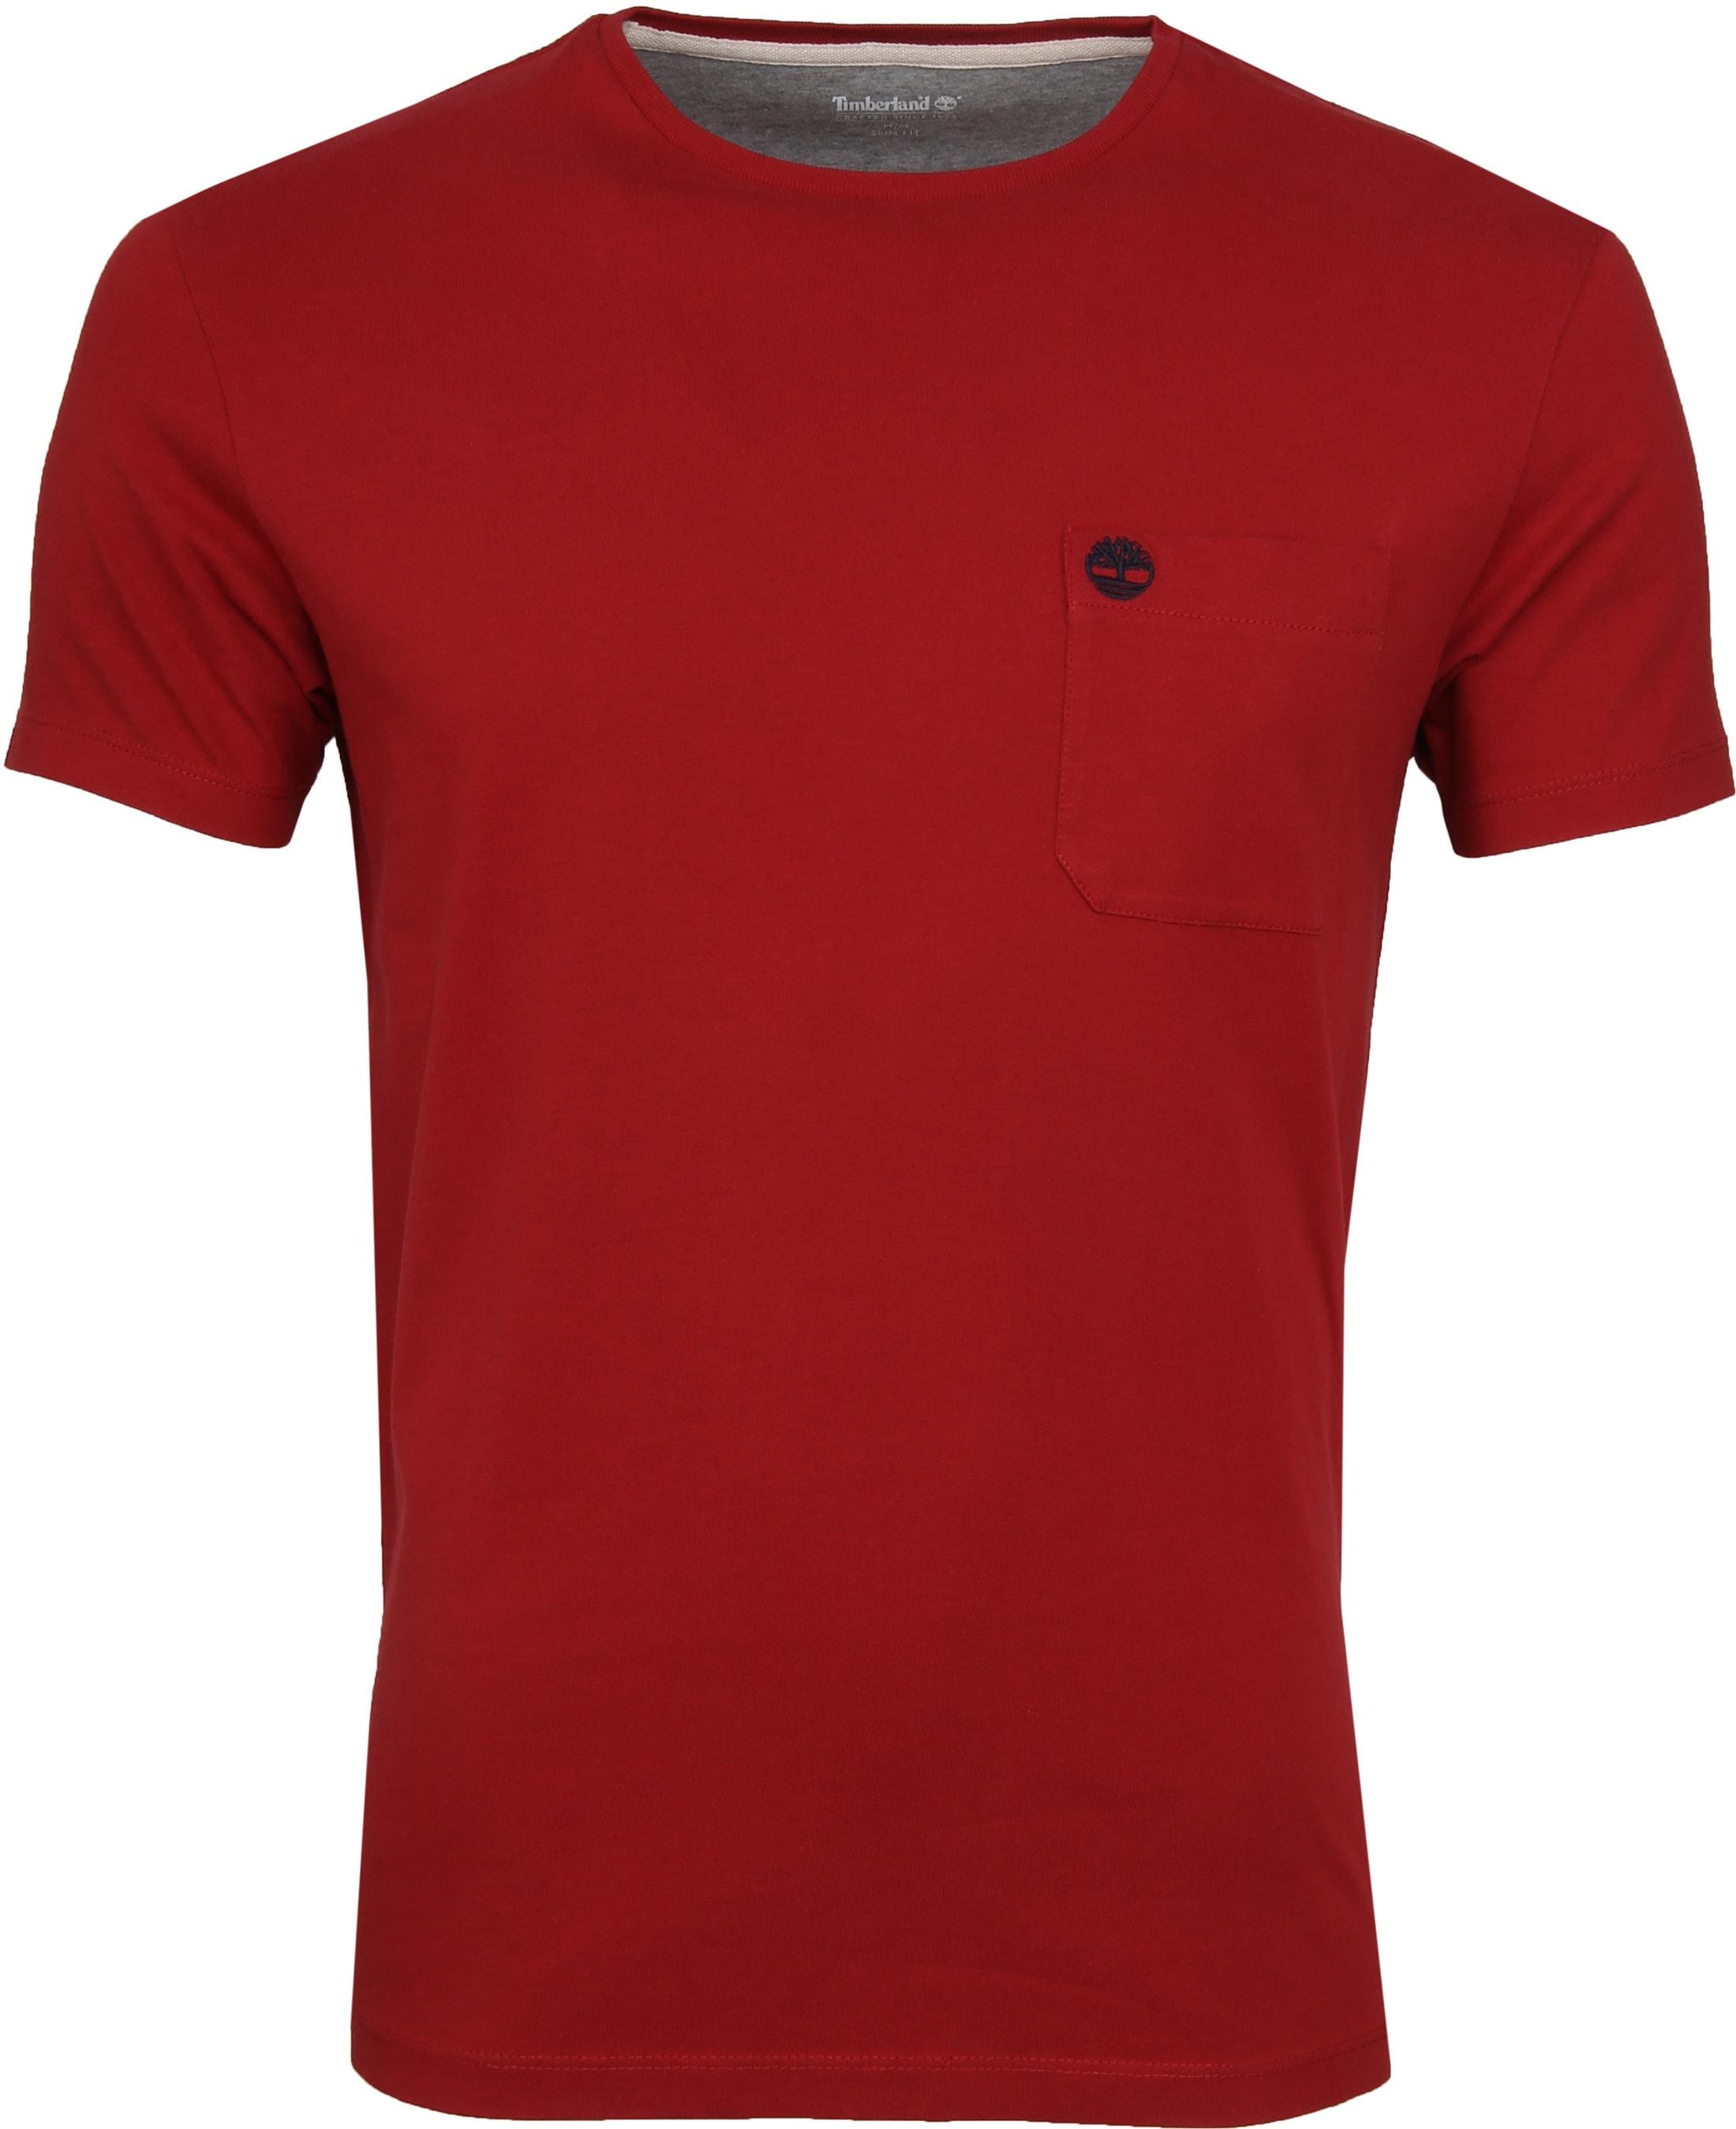 Timberland Dunstan T-shirt Red foto 0